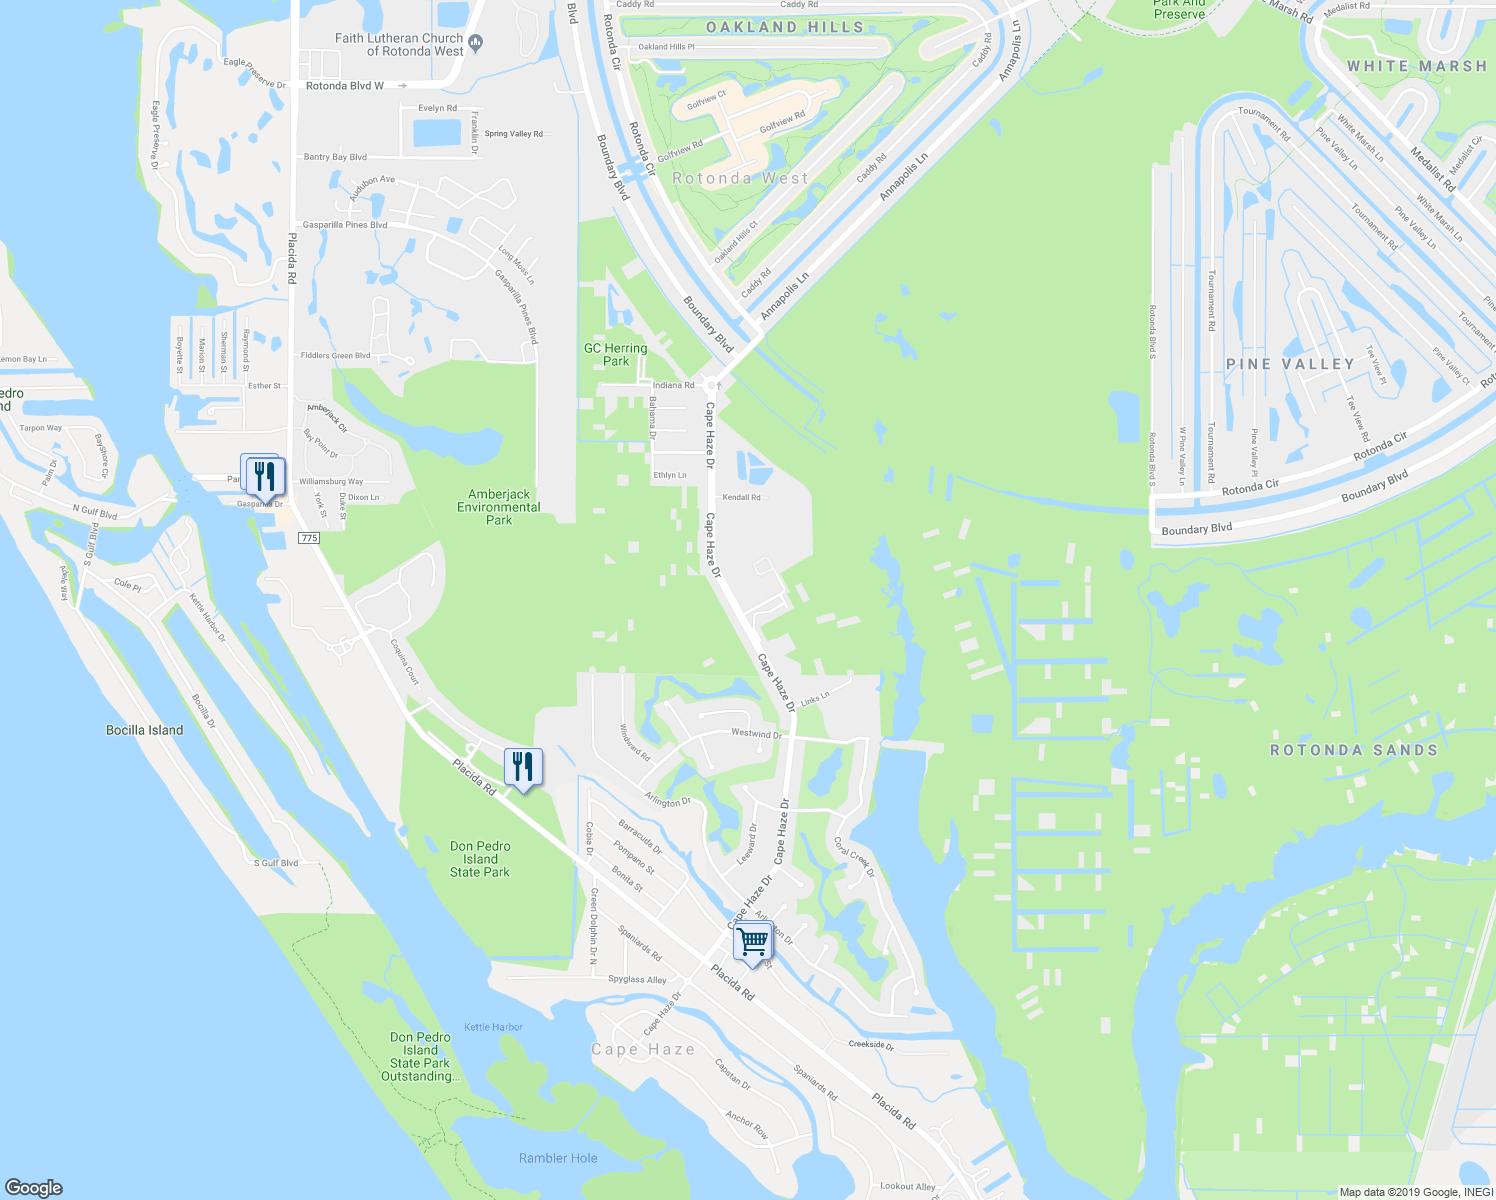 West Naples Rotonda Florida And Area Map - Rotonda Florida Map